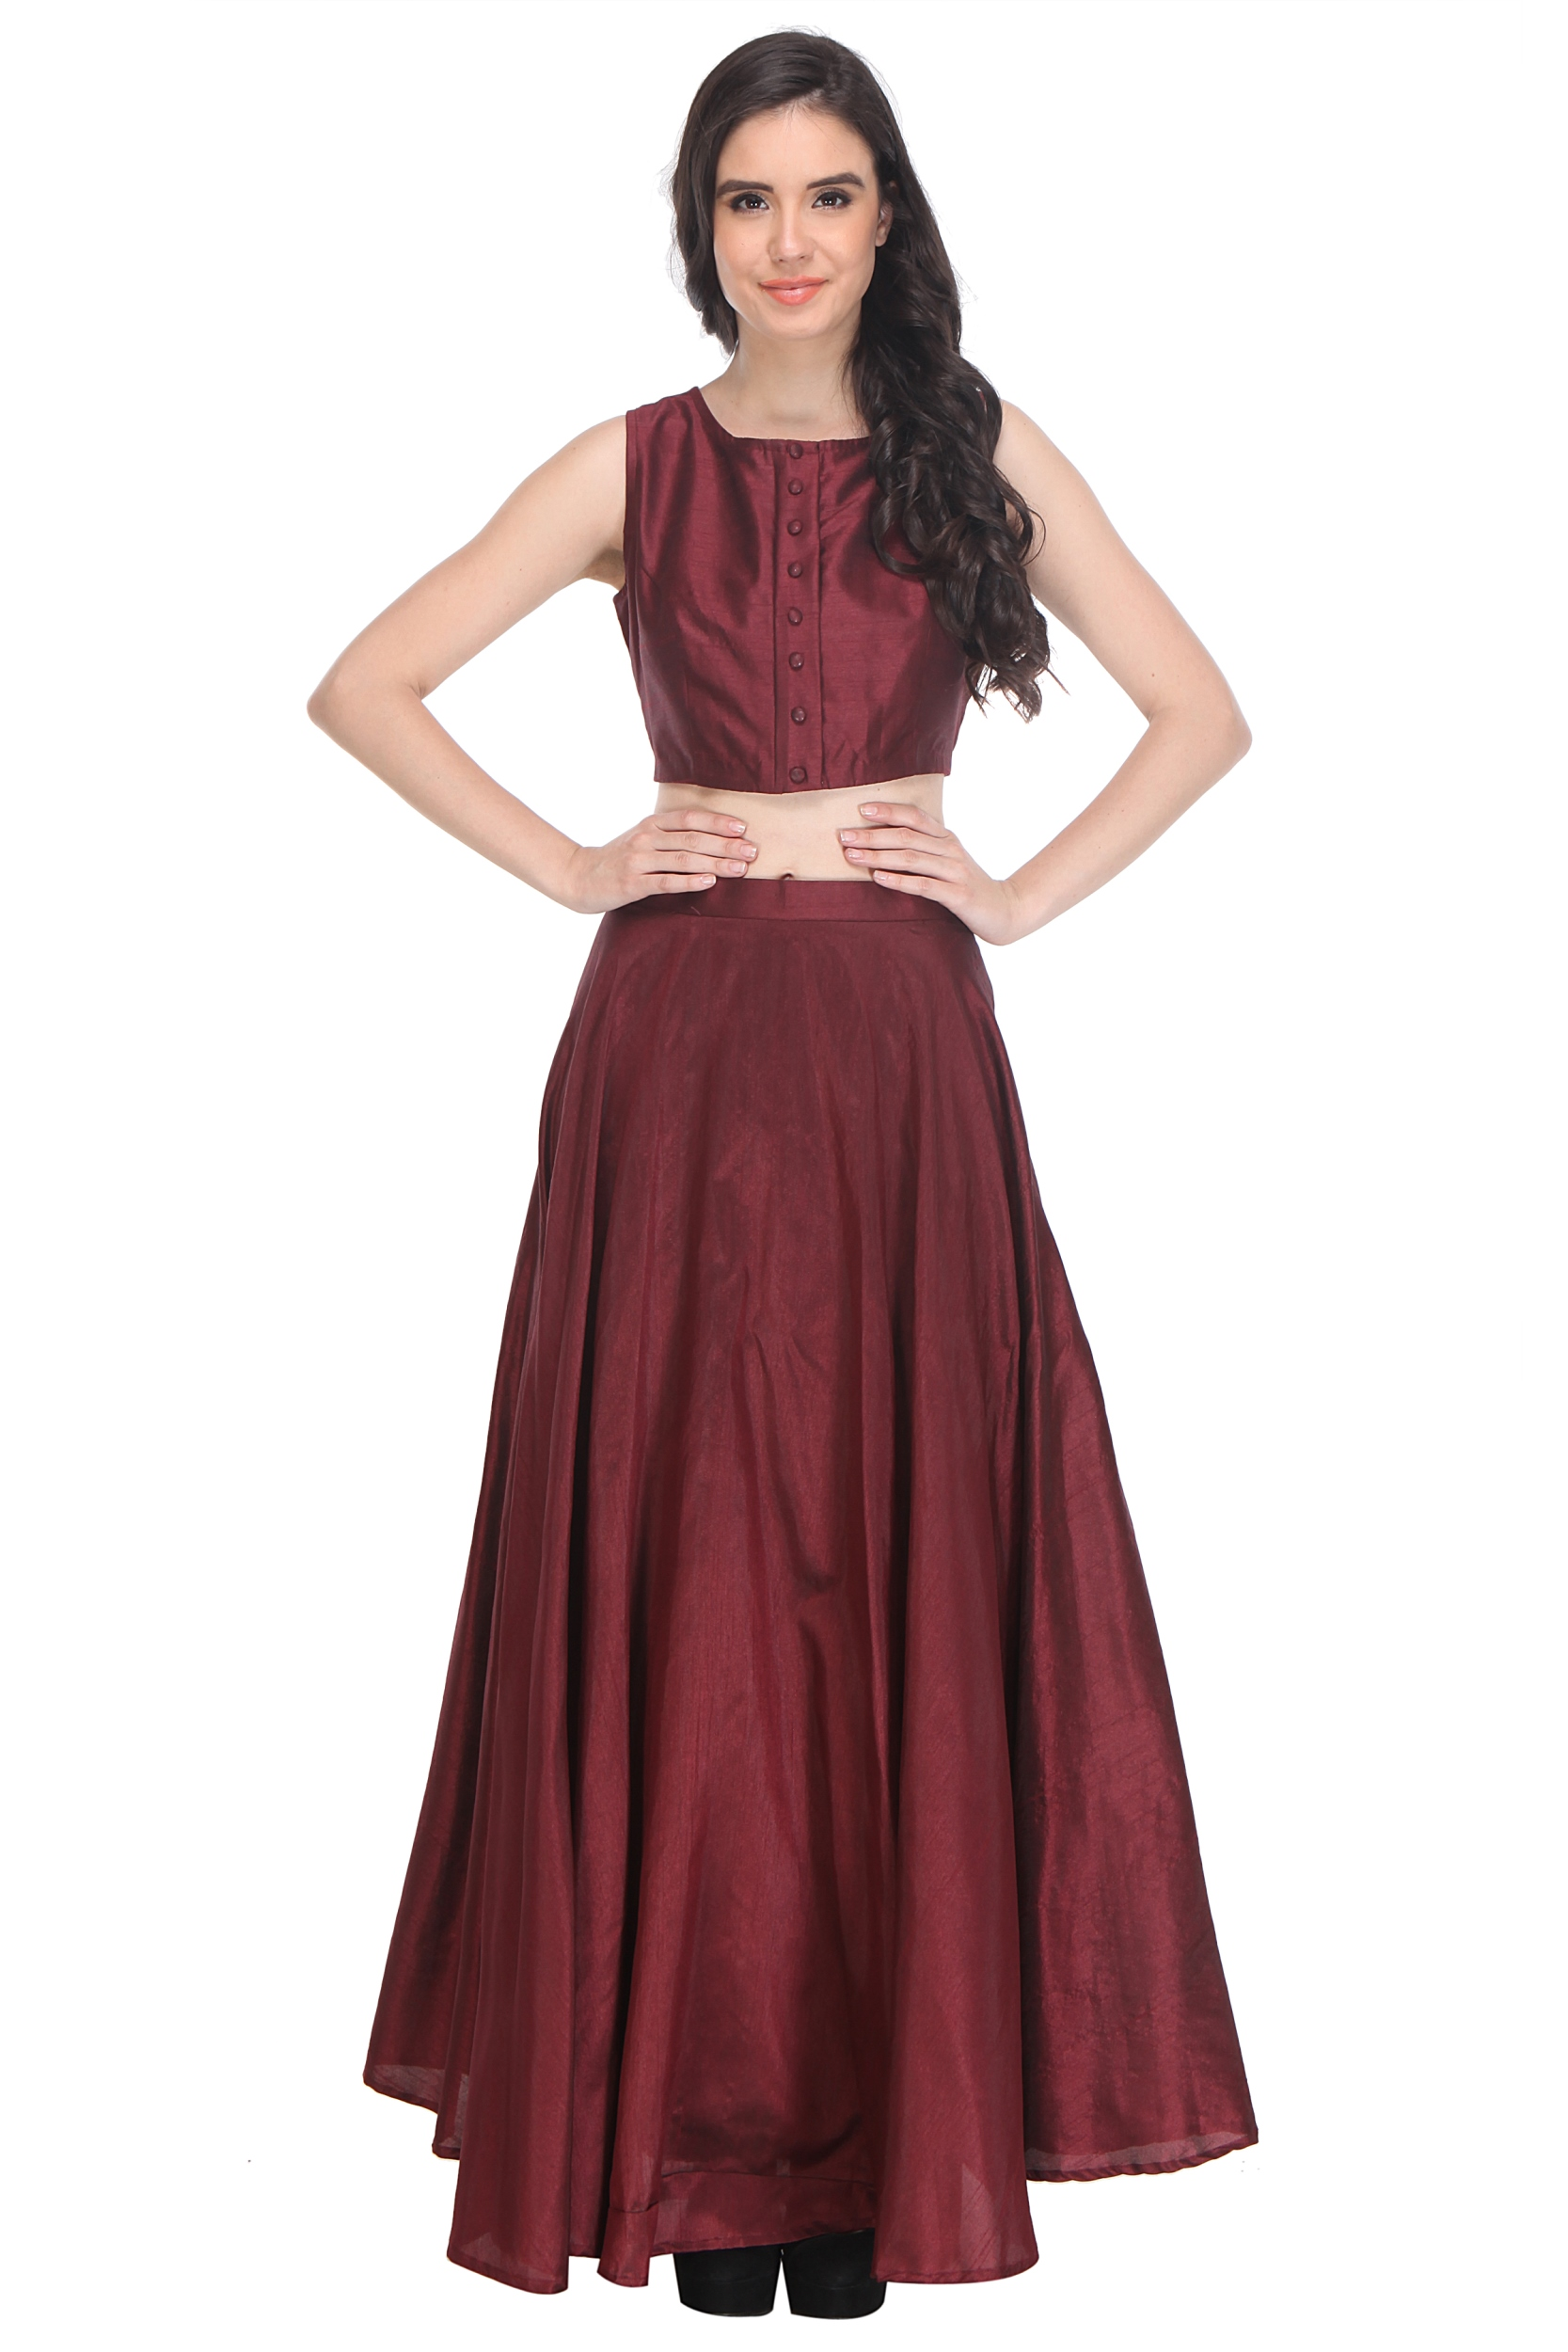 3dc0d90e58a8e3 Maroon Color Raw Silk Shantoon Plain/Solid Crop Top for Women - AIDA -  2221676